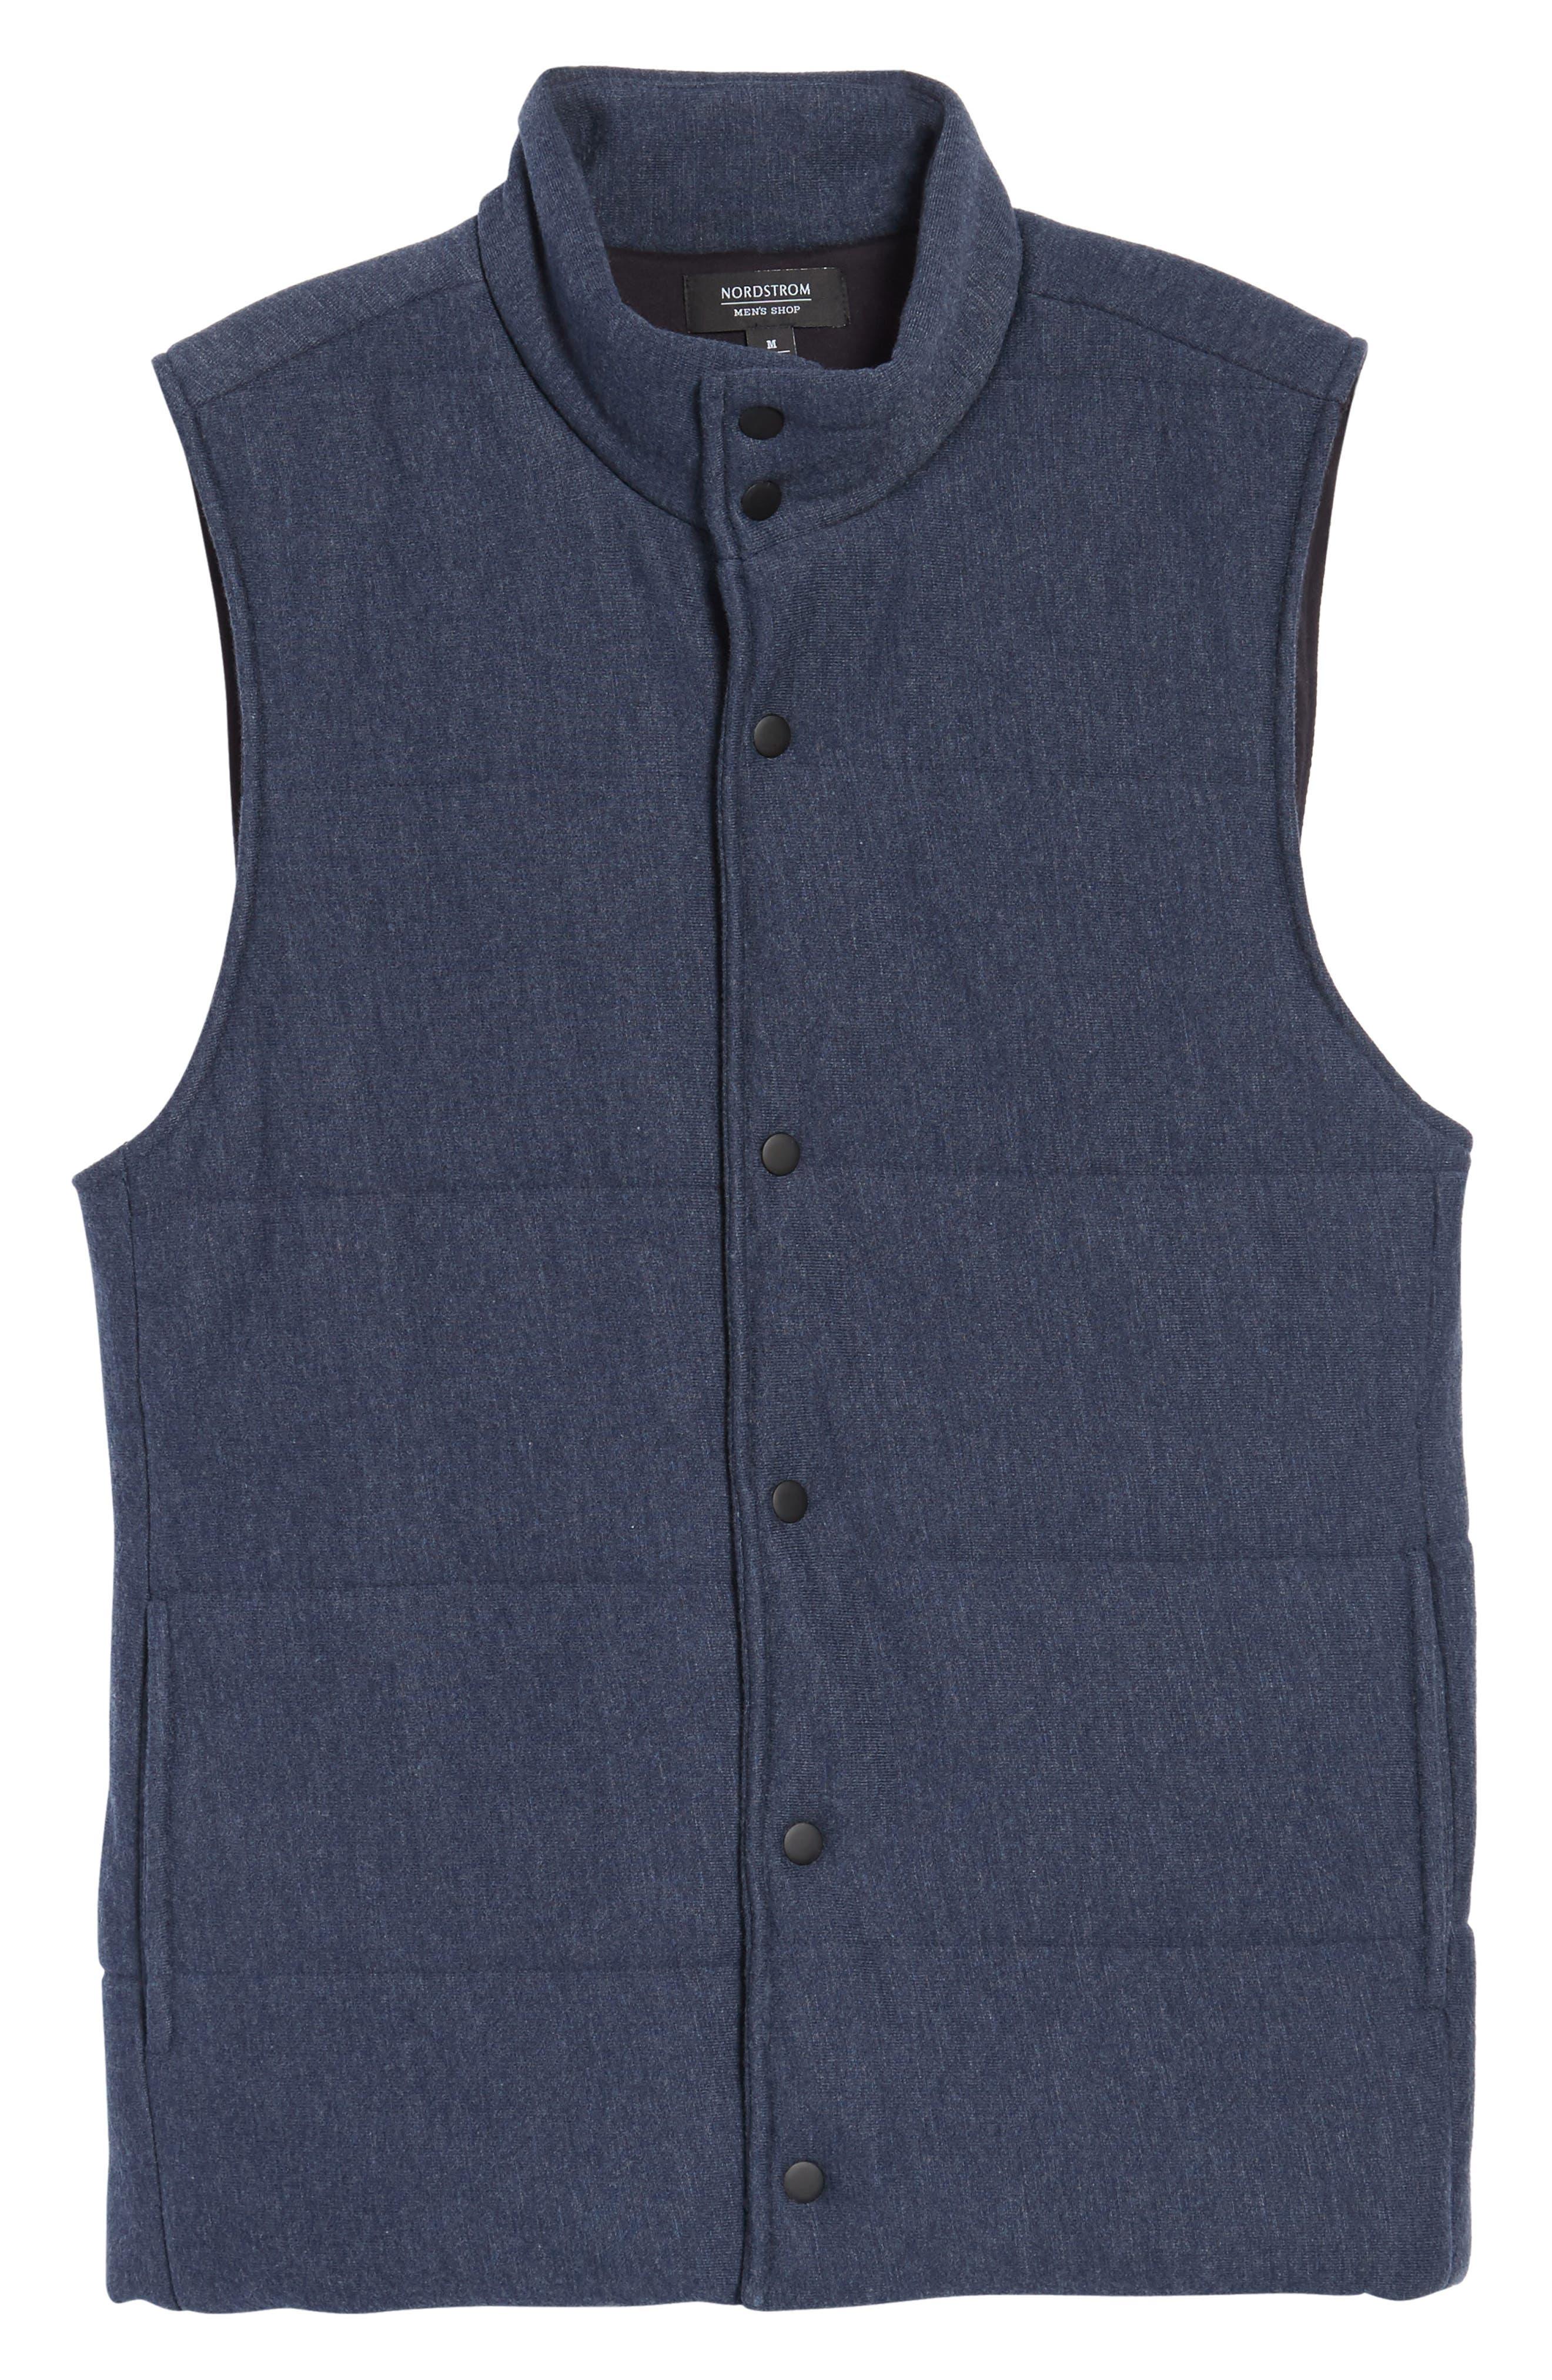 Quilted Fleece Vest,                             Alternate thumbnail 6, color,                             Navy Iris Heather